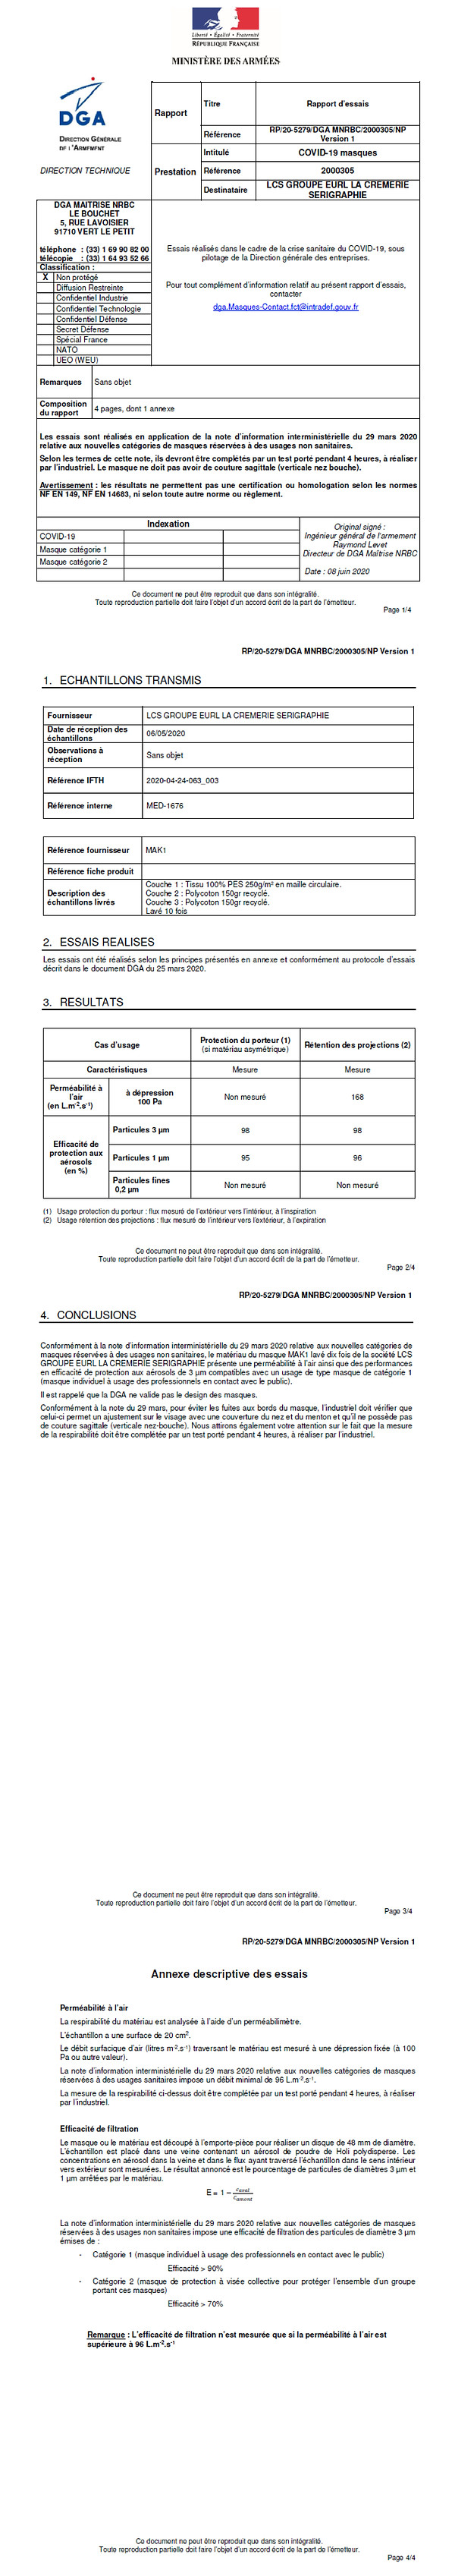 Rapport 5279-01.jpg